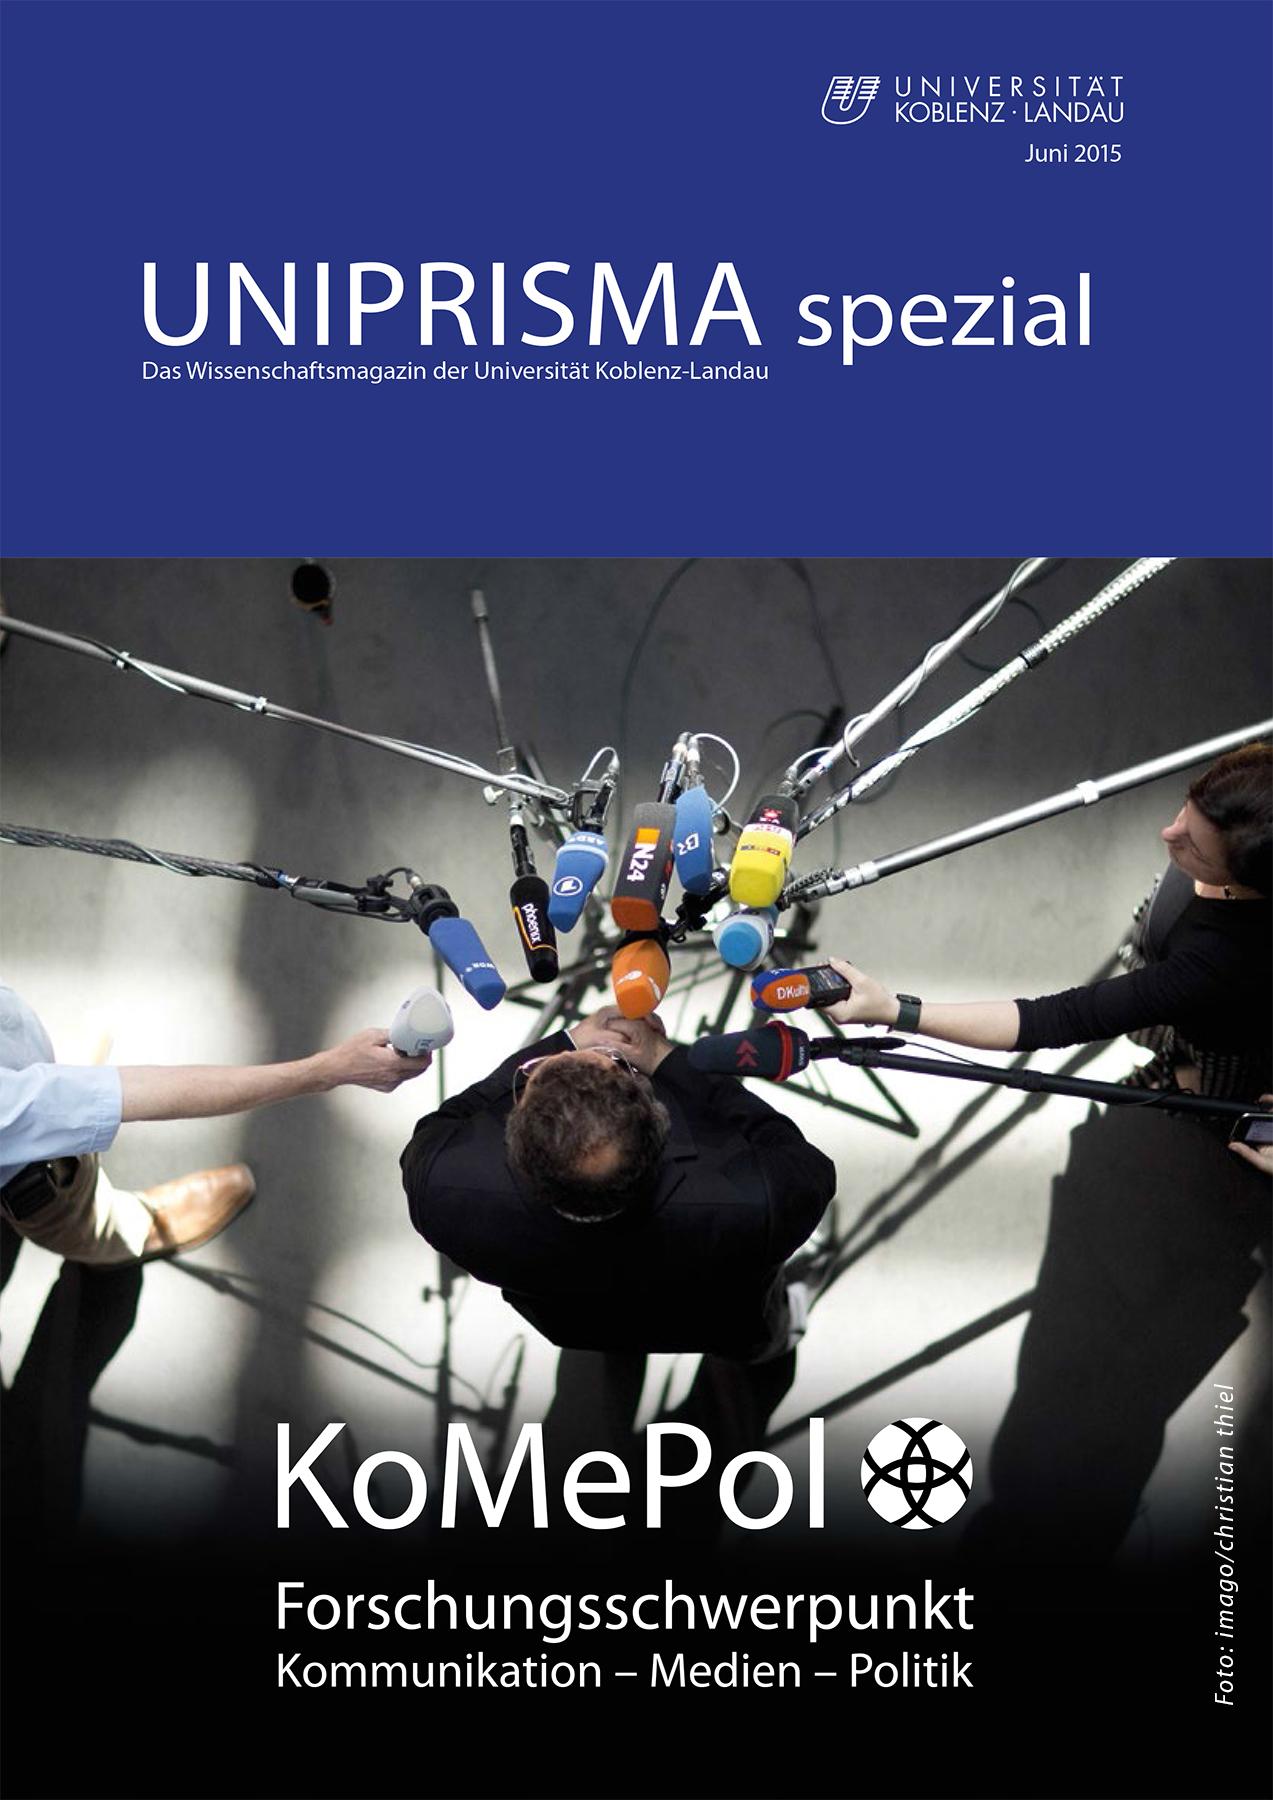 UNIPRISMA spezial - Deckblatt Juni 2015